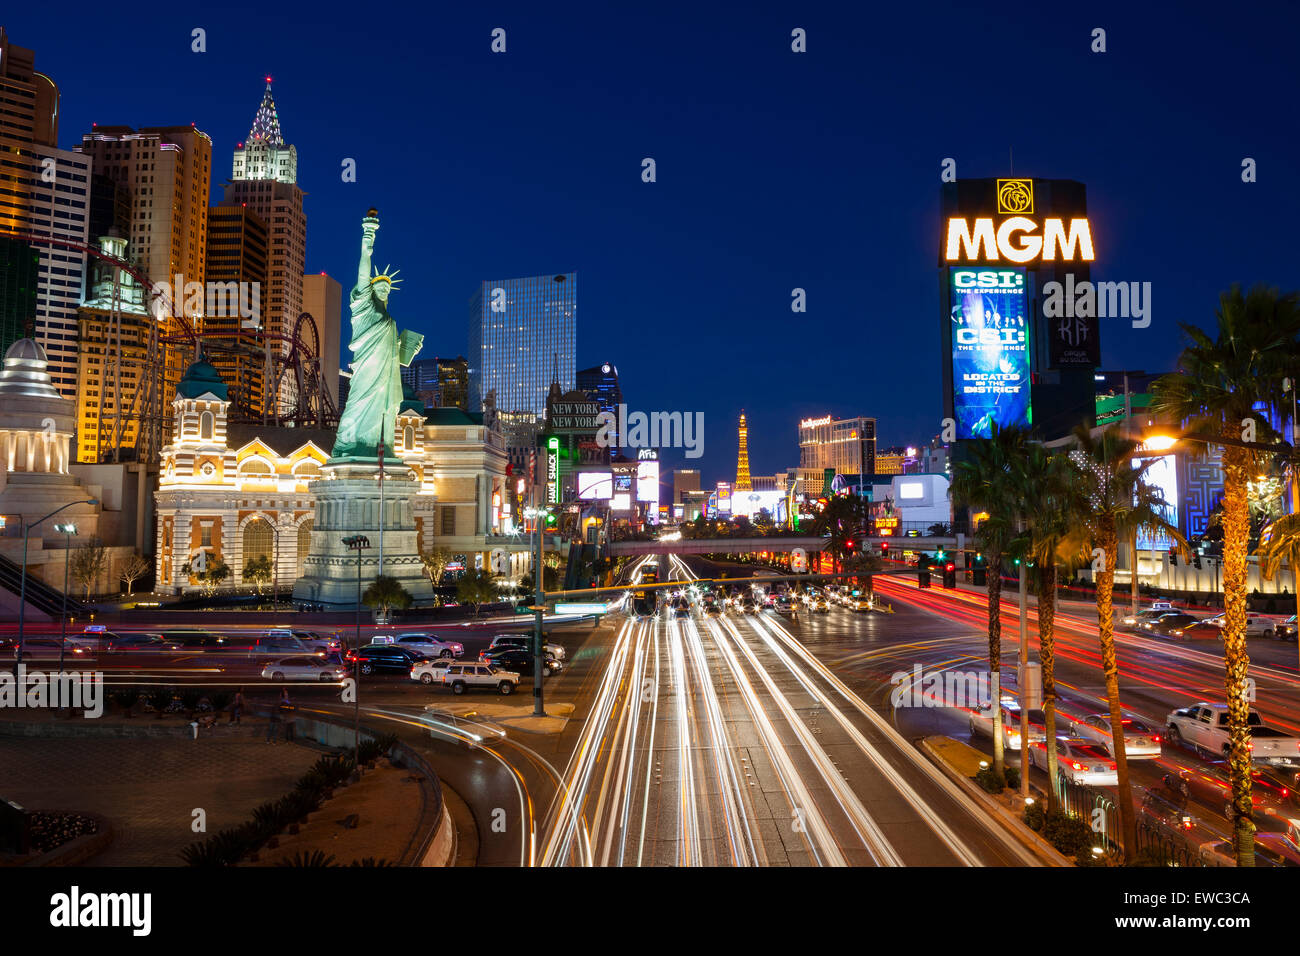 "Las Vegas Boulevard ""The Strip"" Langzeitbelichtung Nacht erschossen. Ansicht des MGM Grand Hotel and New Stockbild"